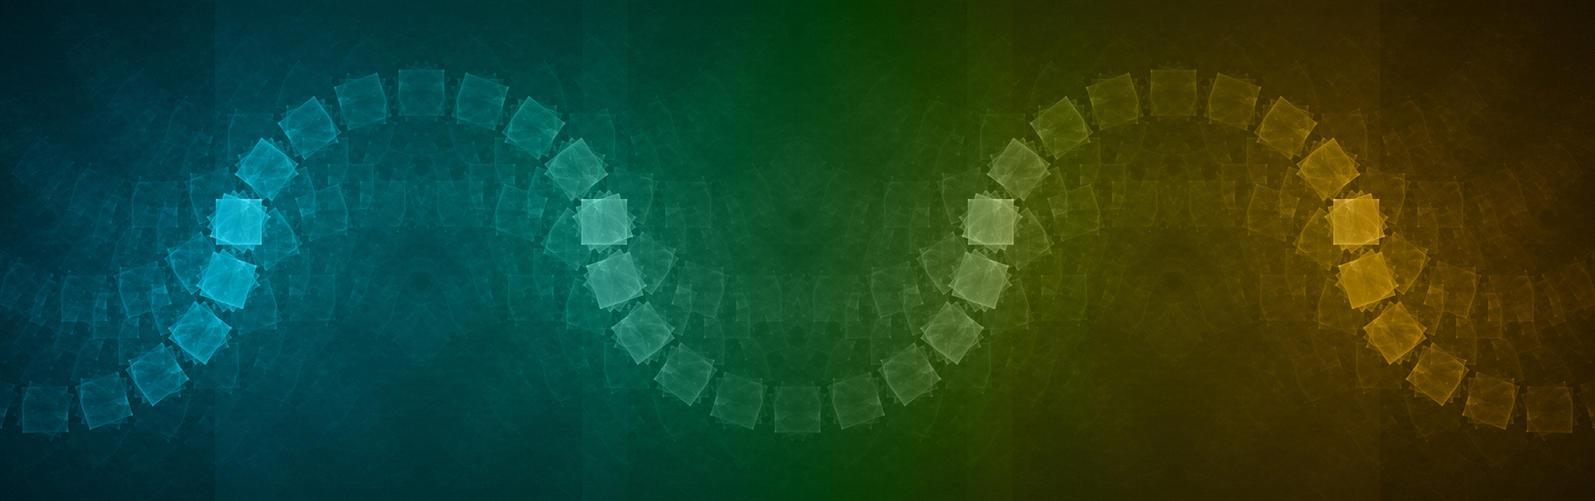 Pathways_DualScreen by Organization13x